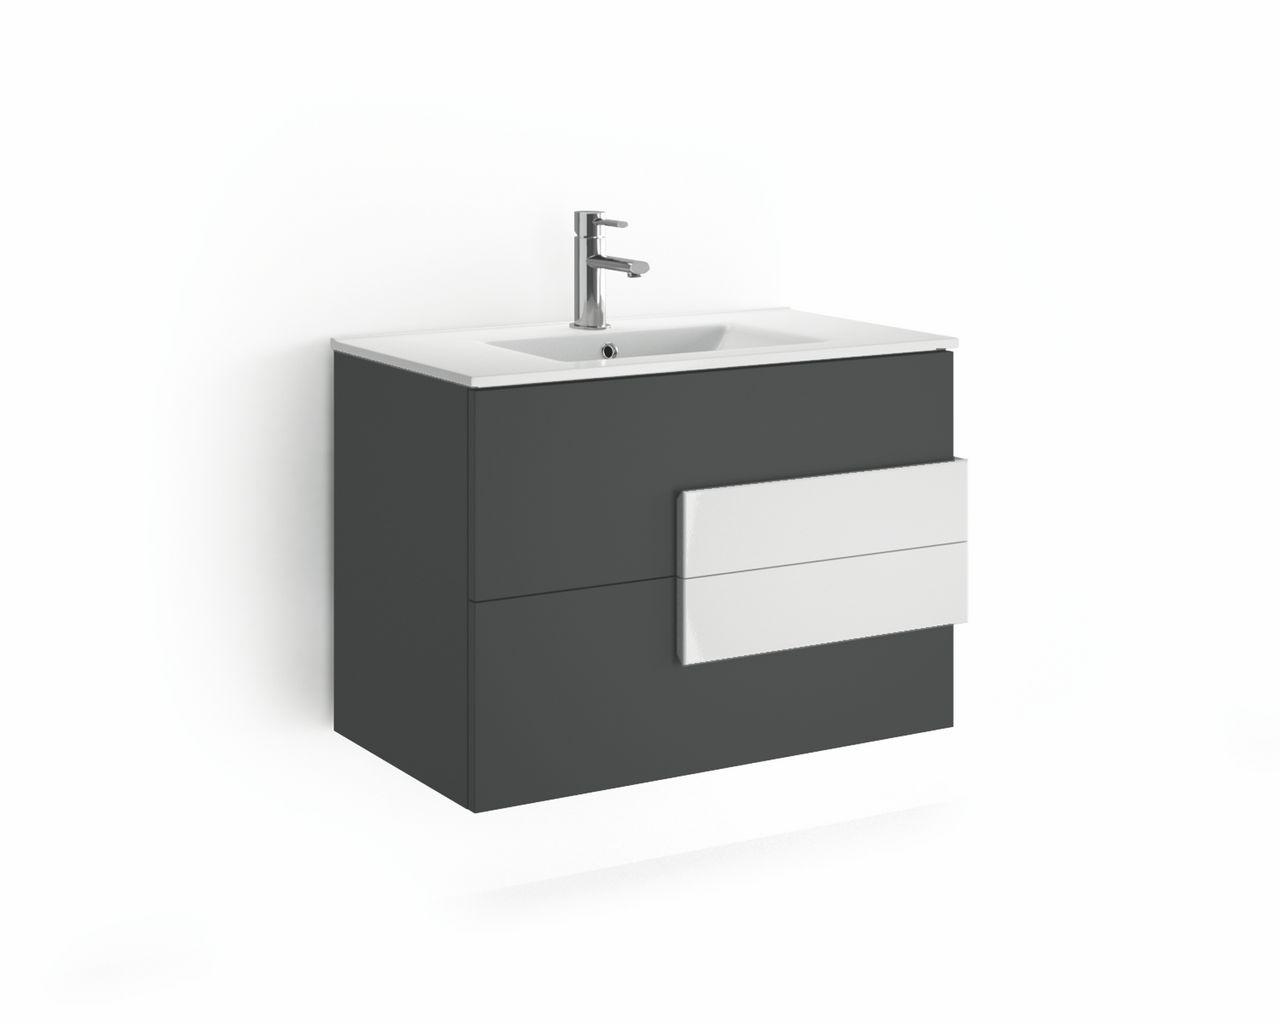 Badkamer Antraciet Wit : Badkamer accessoires muebles cronos premium badkamermeubel